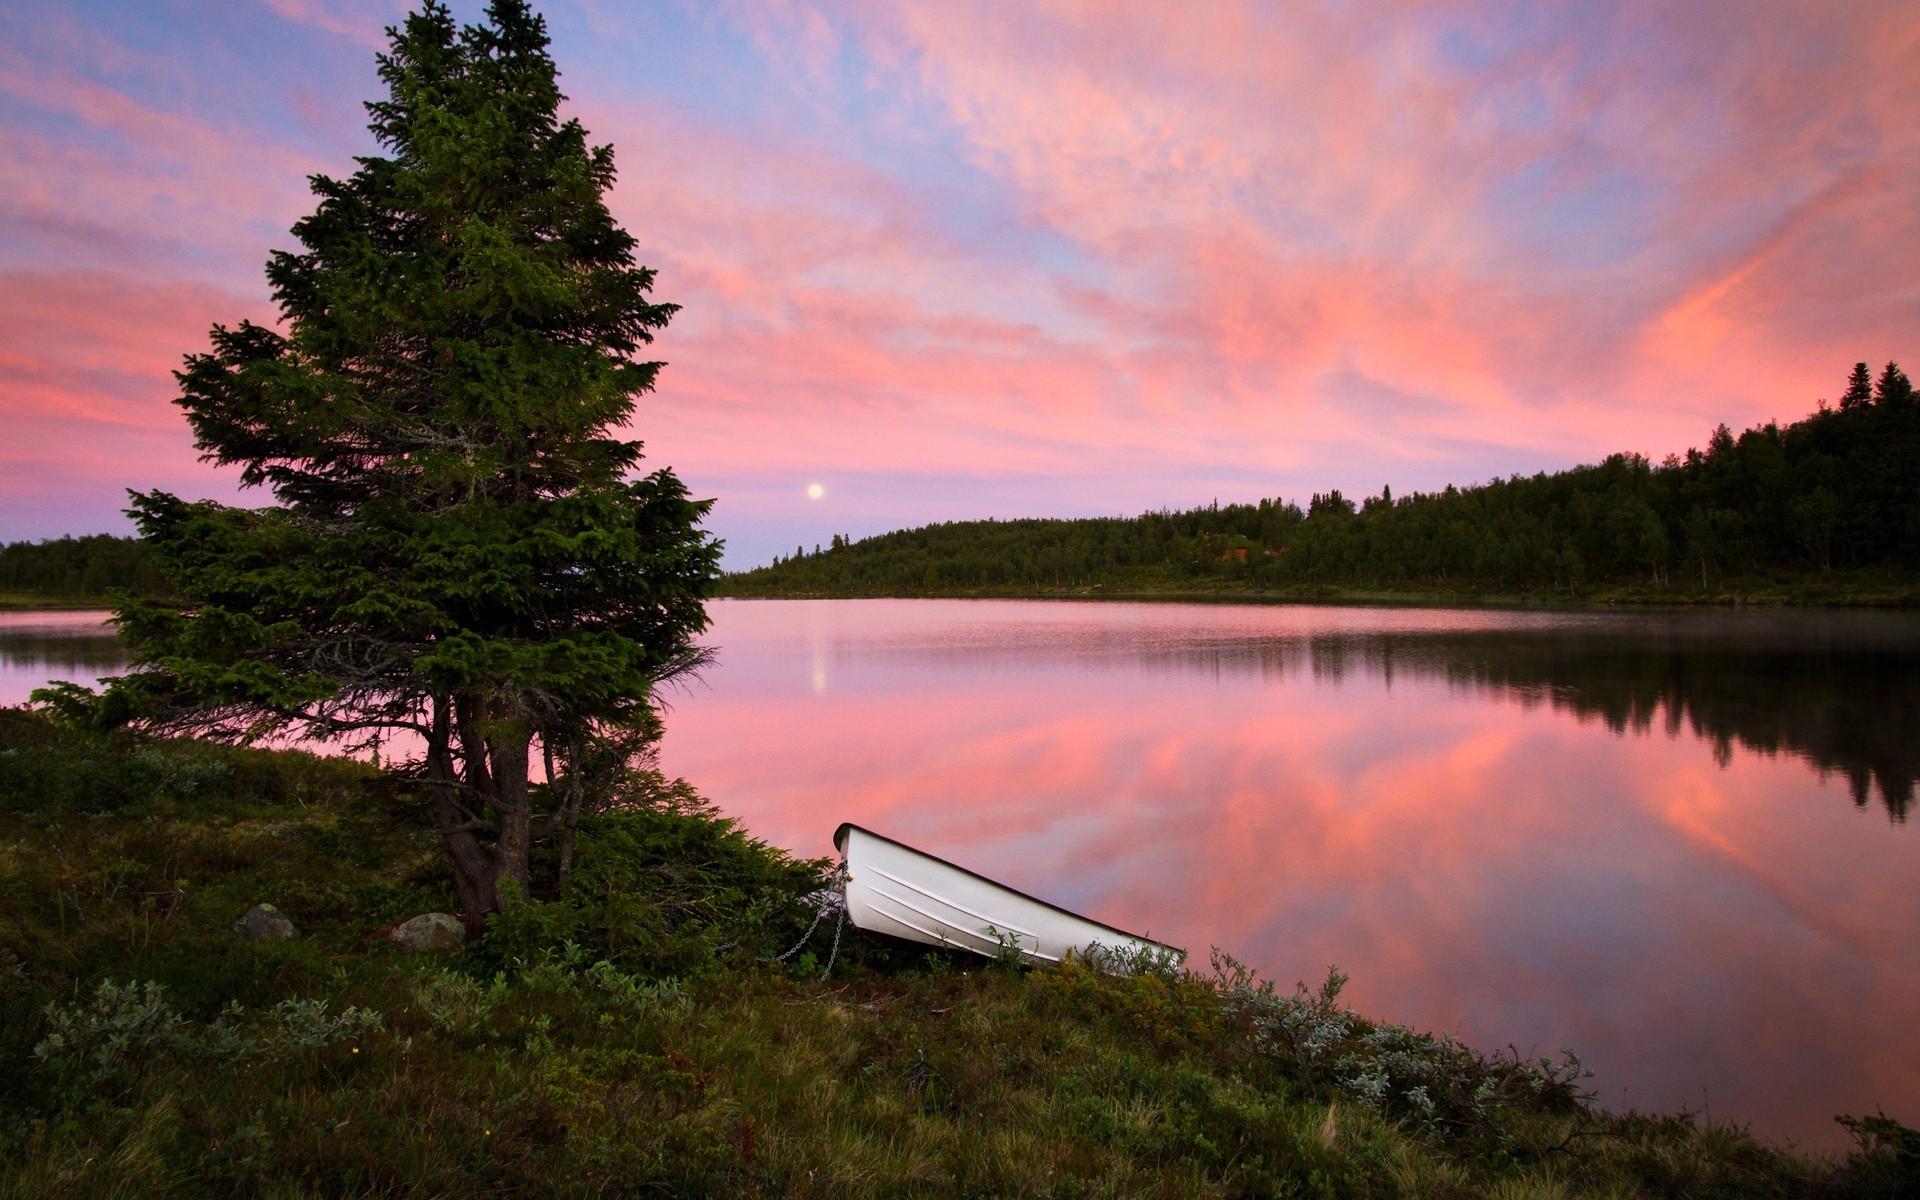 Download wallpaper Sunrise over the lake